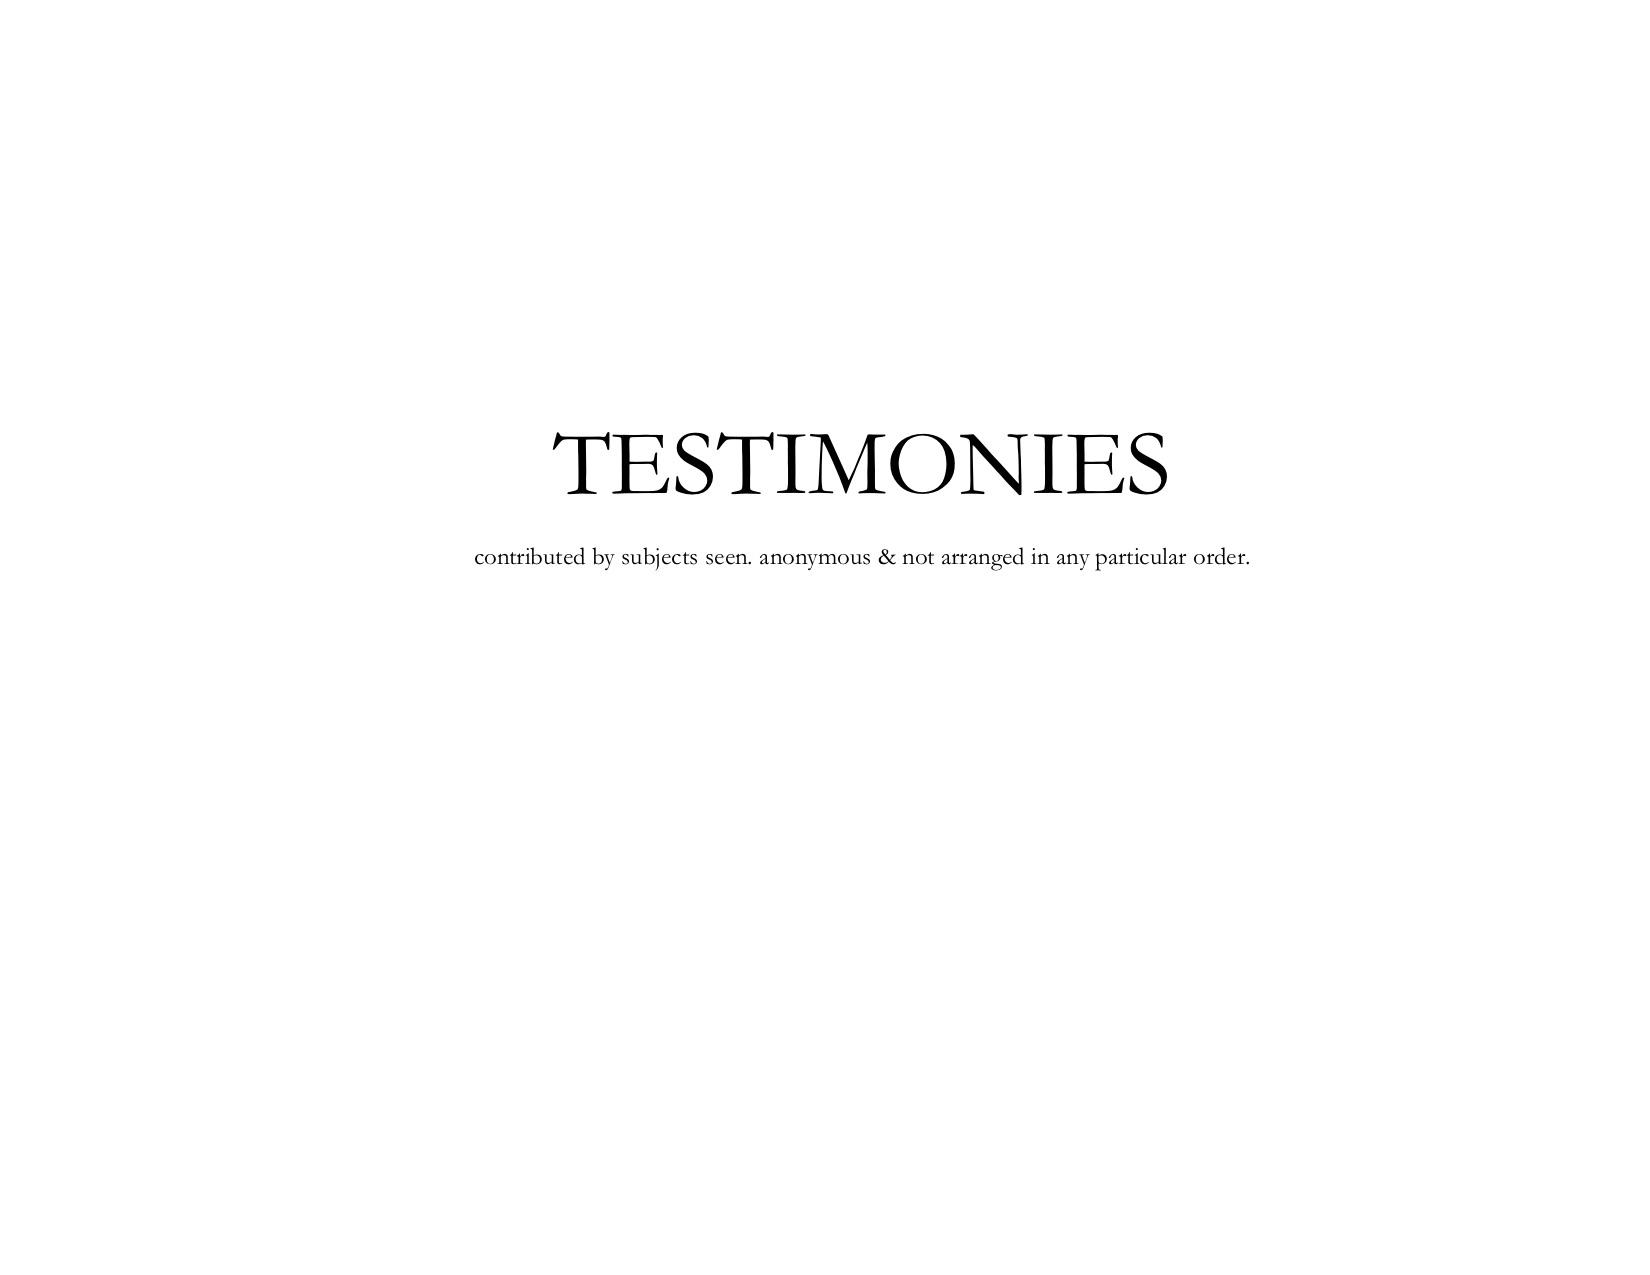 Testimonies Cover Page.jpg